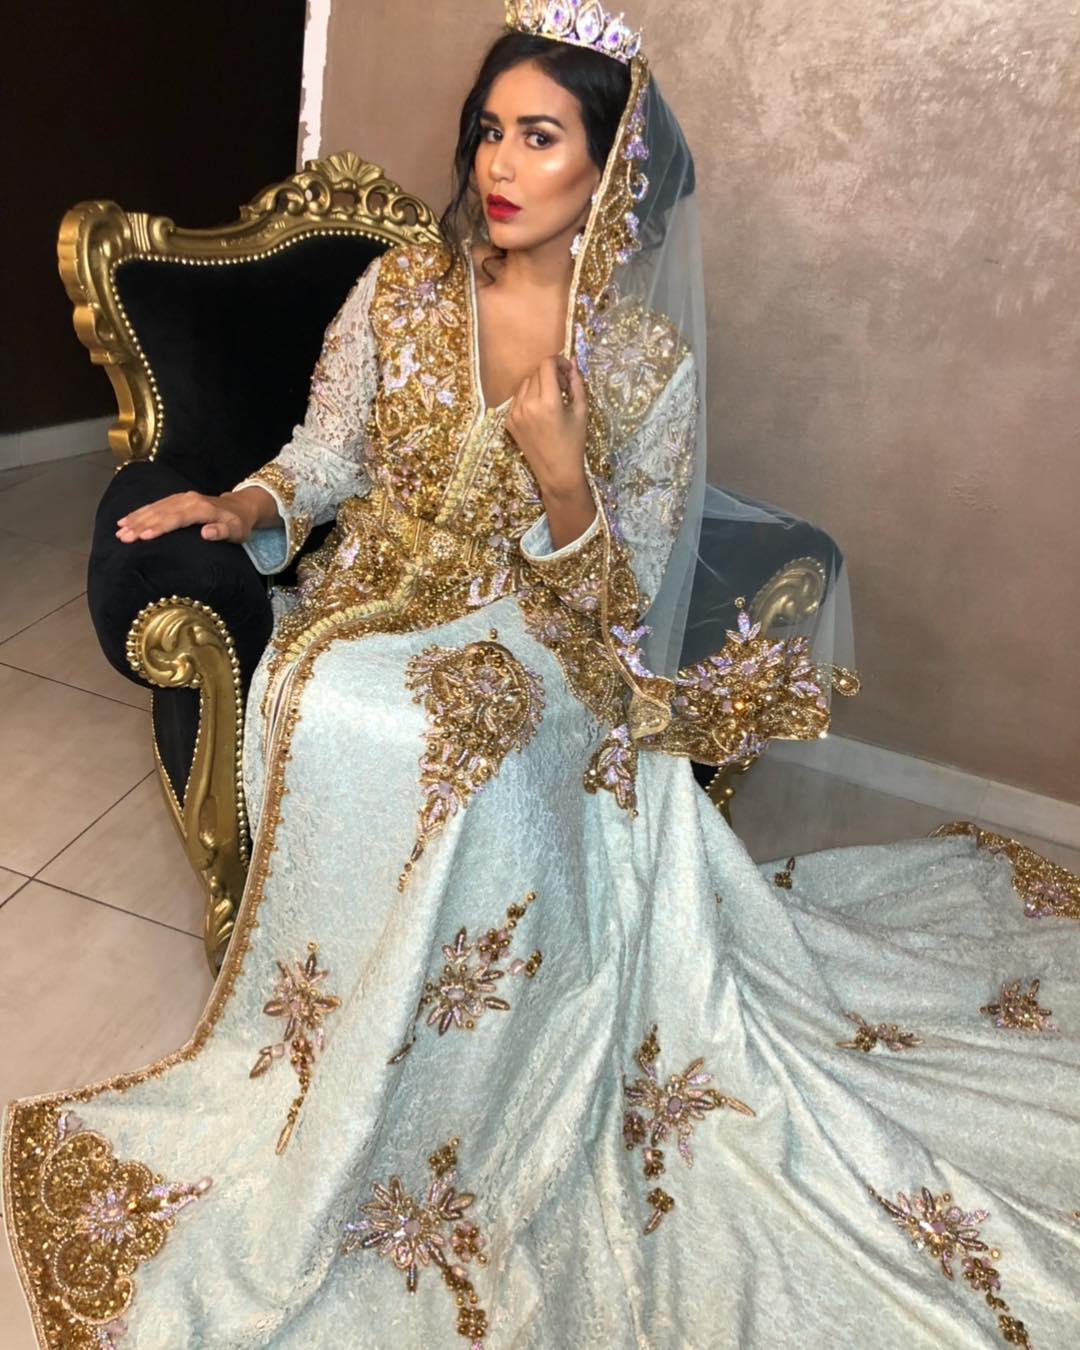 Vente et location caftan et robe marocaine 2019 , Caftan Maroc